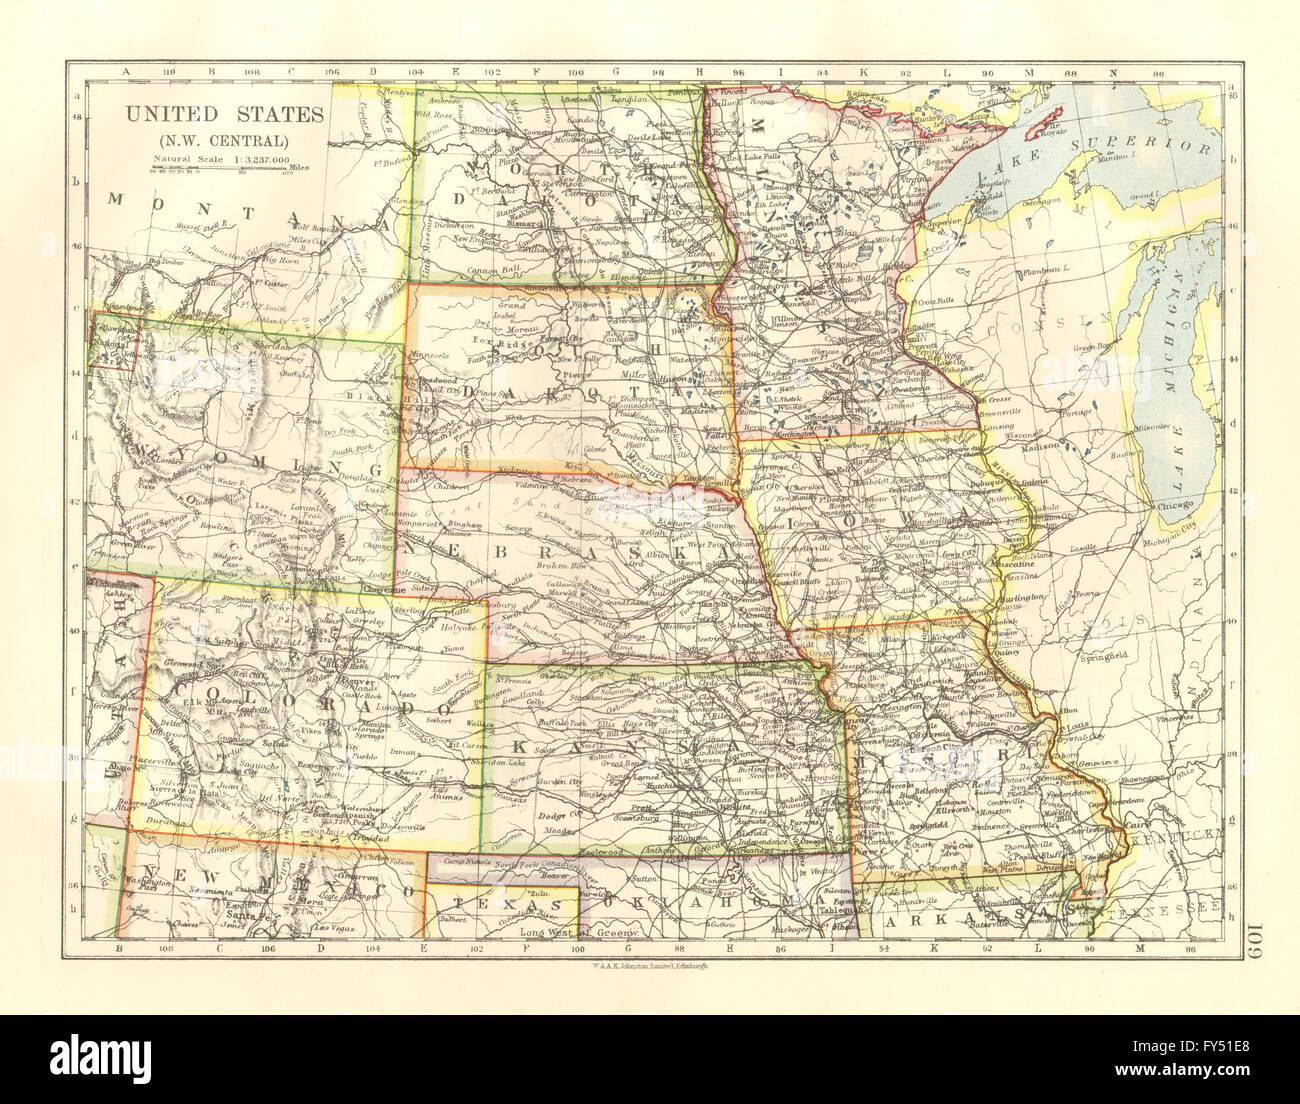 USA PLAINS STATES Iowa Minnesota Kansas NE ND SD Colorado - Ne usa